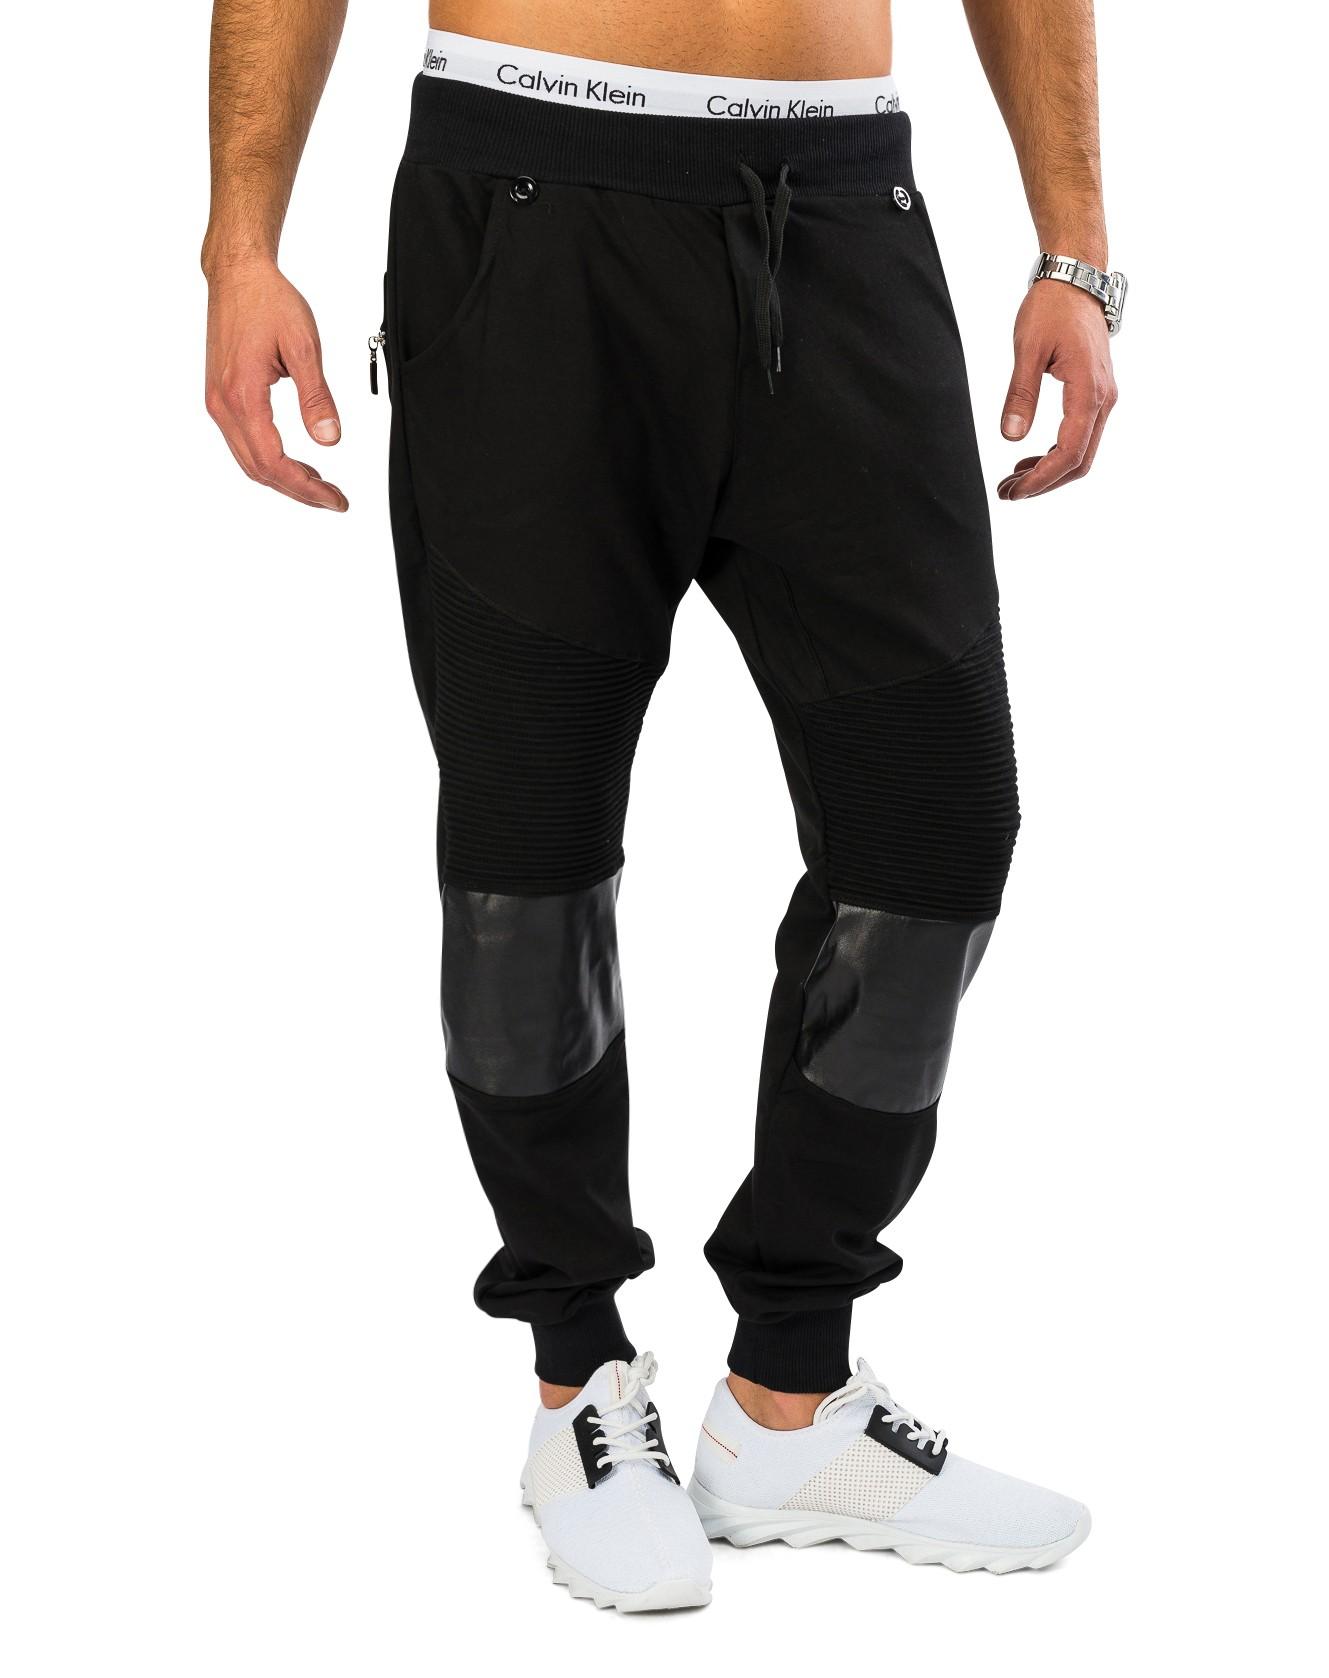 Herren-Jogginghose-mit-Hosentraegern-Harem-Style-Leder-Patches-Trend-Freizeithose